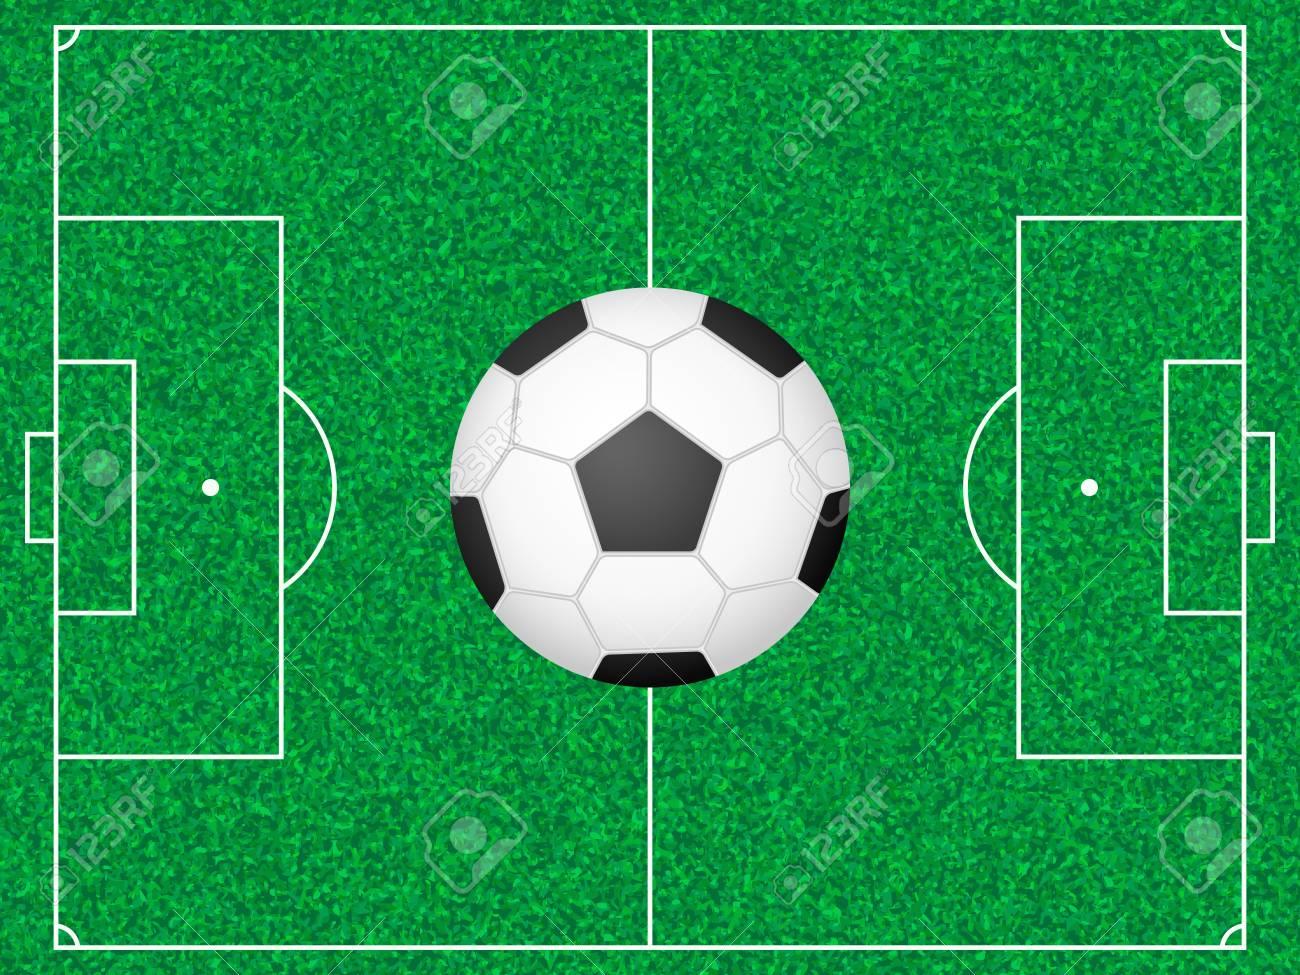 Green football field and ball illustration Stock Vector - 13618305